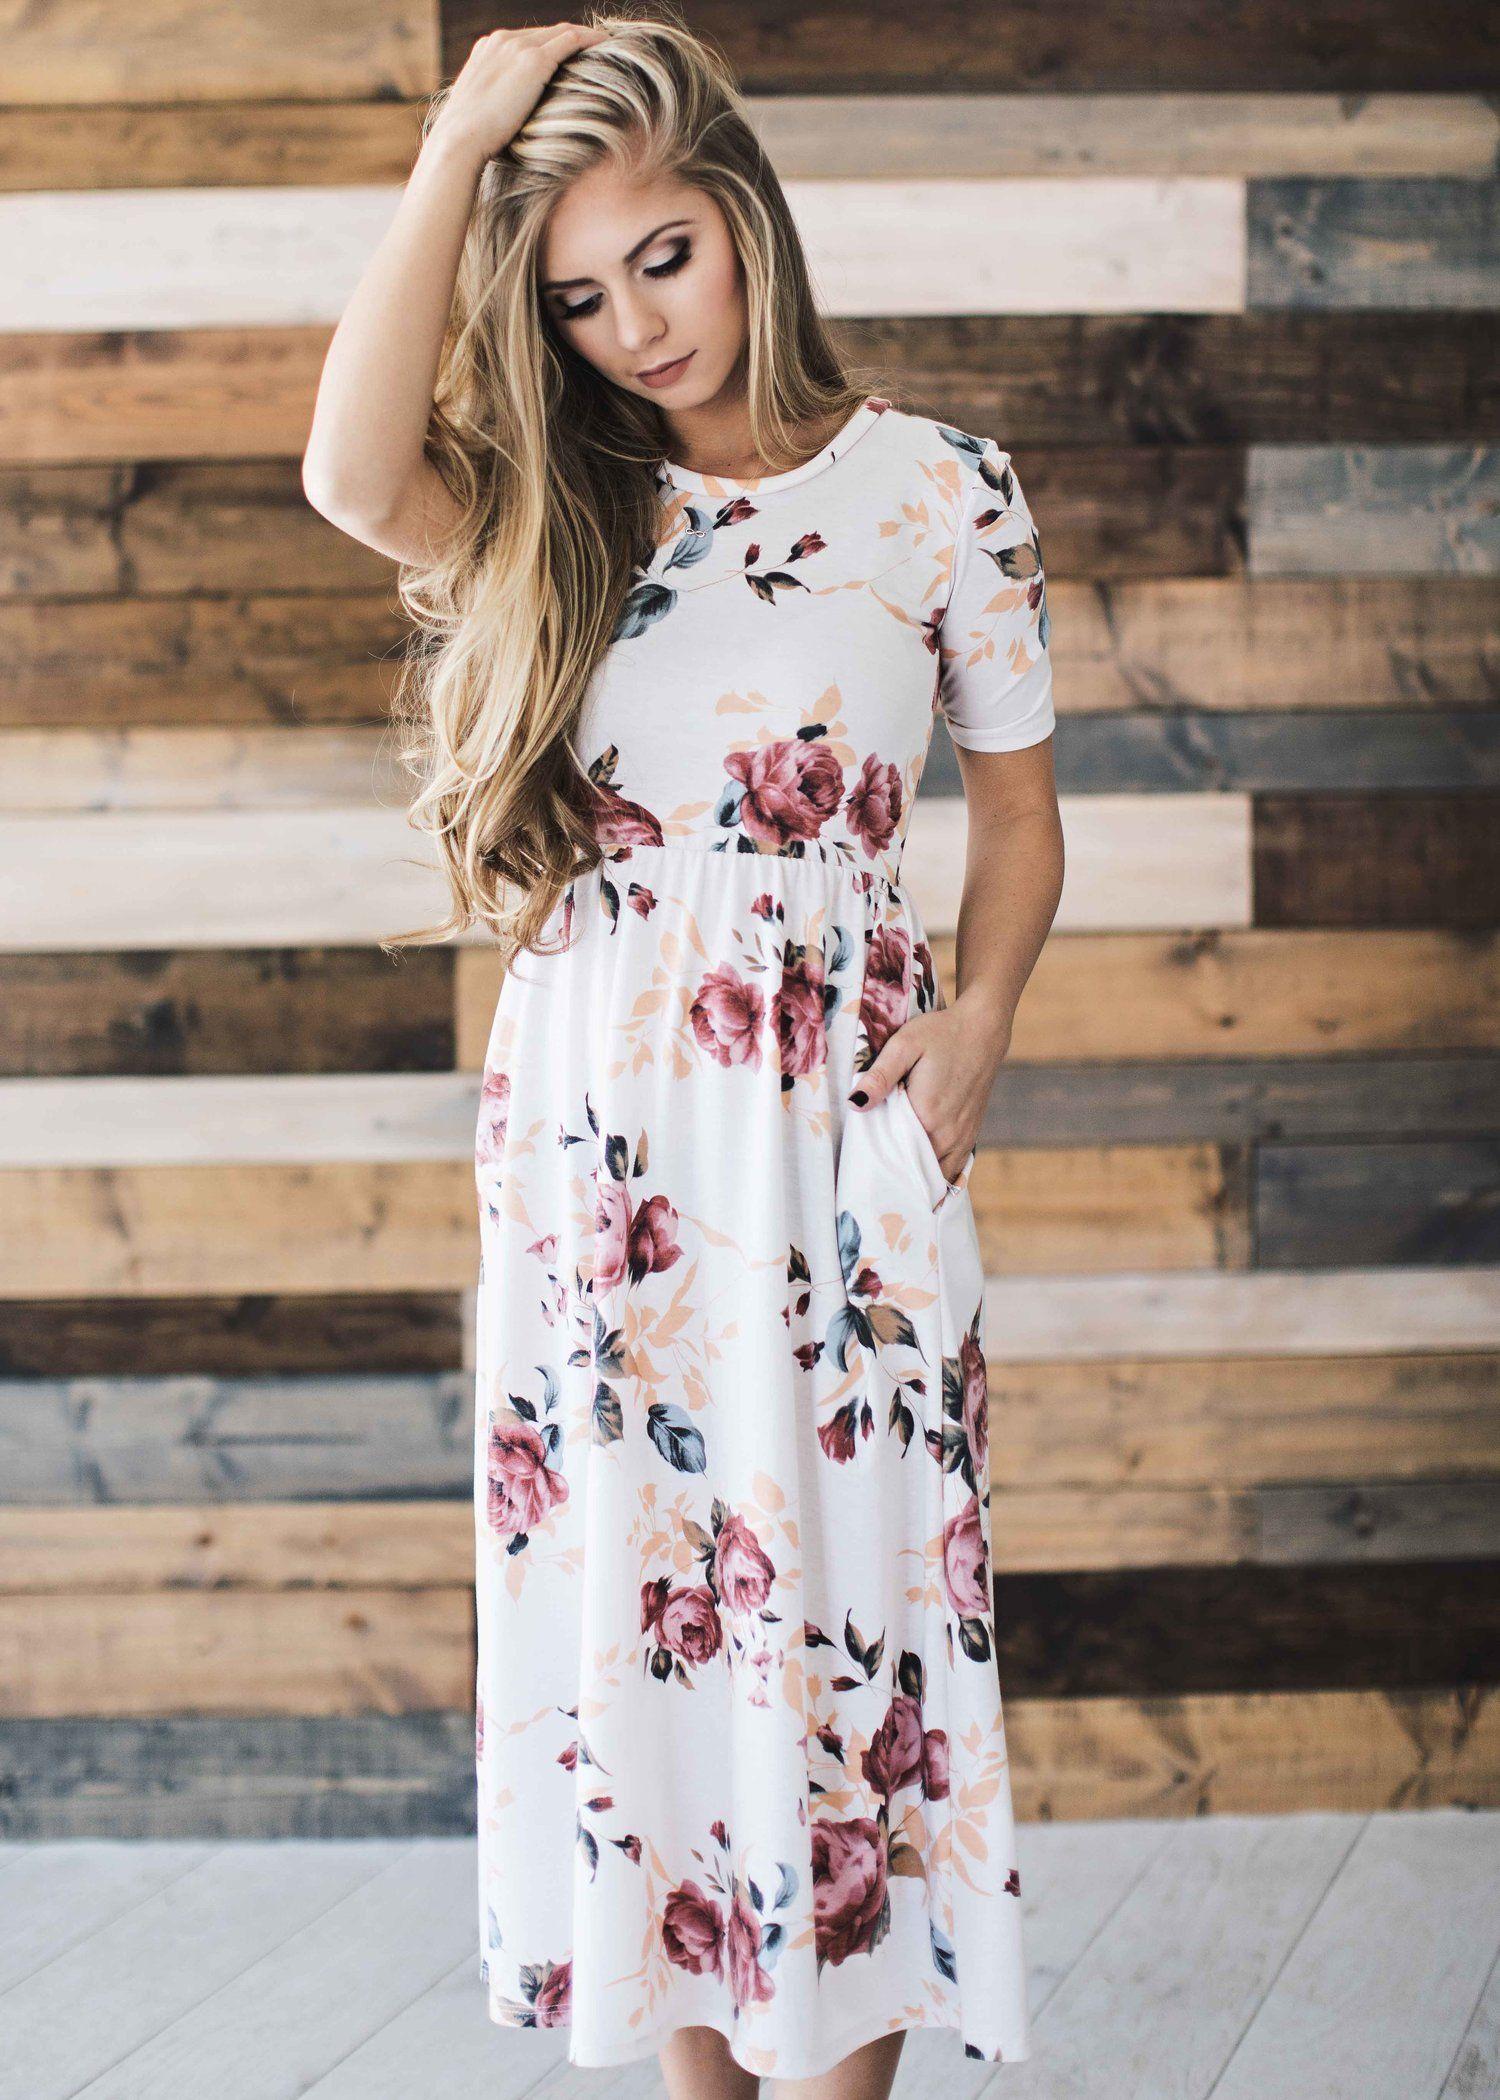 Women s fashion top 9 must haves in the wardrobe lulu rose - Amara Rose Midi Dress